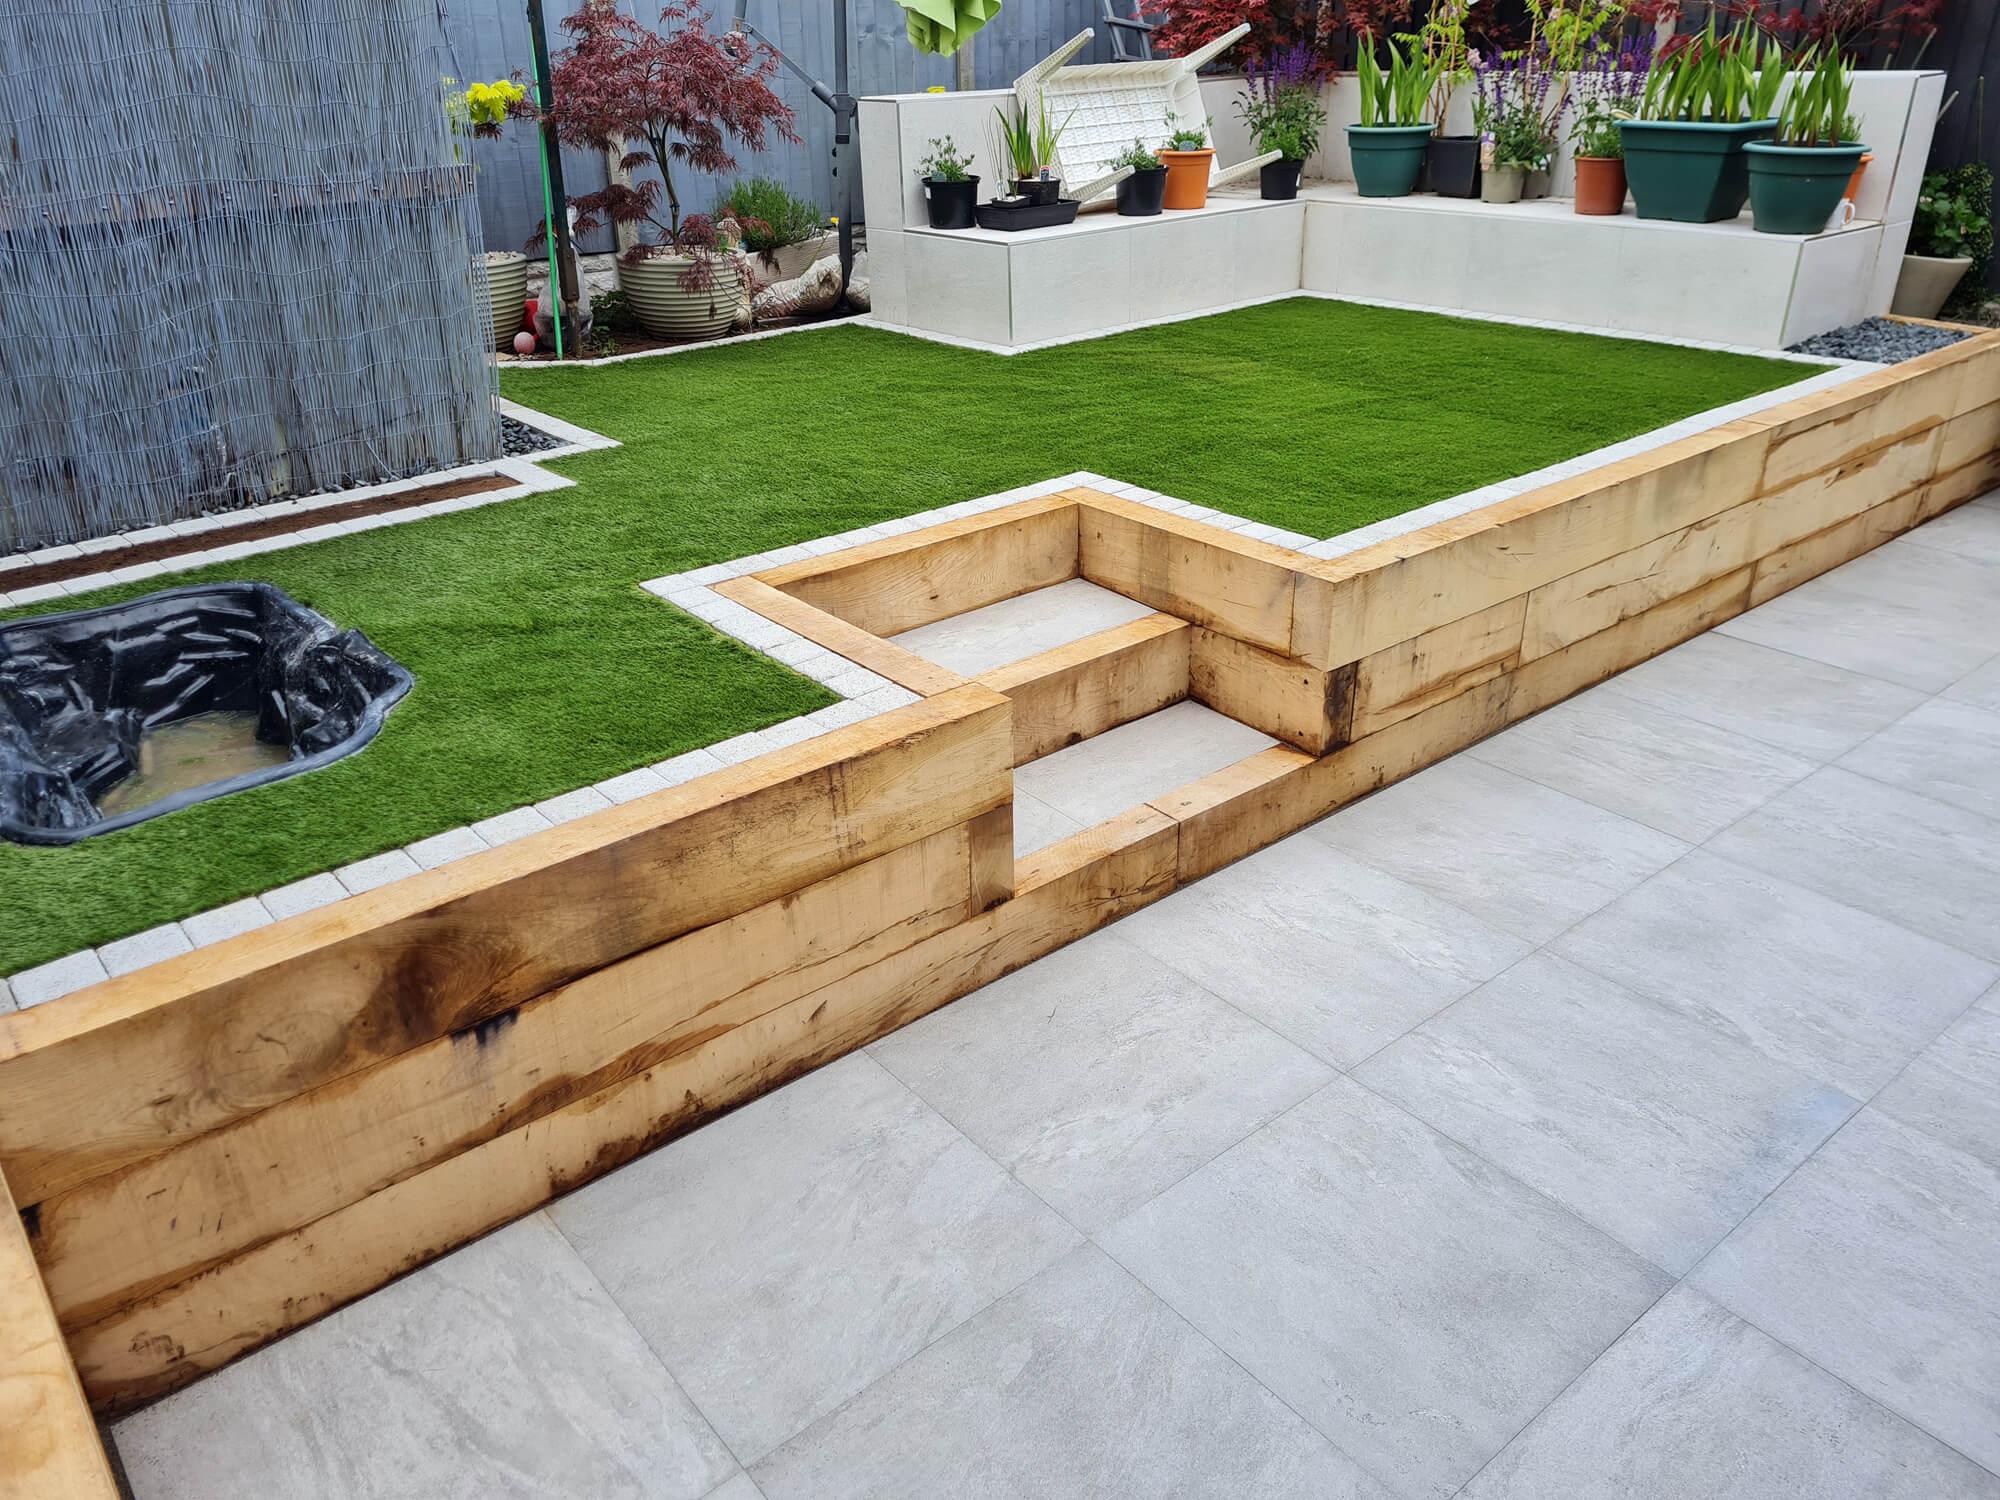 JD Landscapes Upper & Lower Tier Garden with Oak Timber Sleepers & Artificial Grass